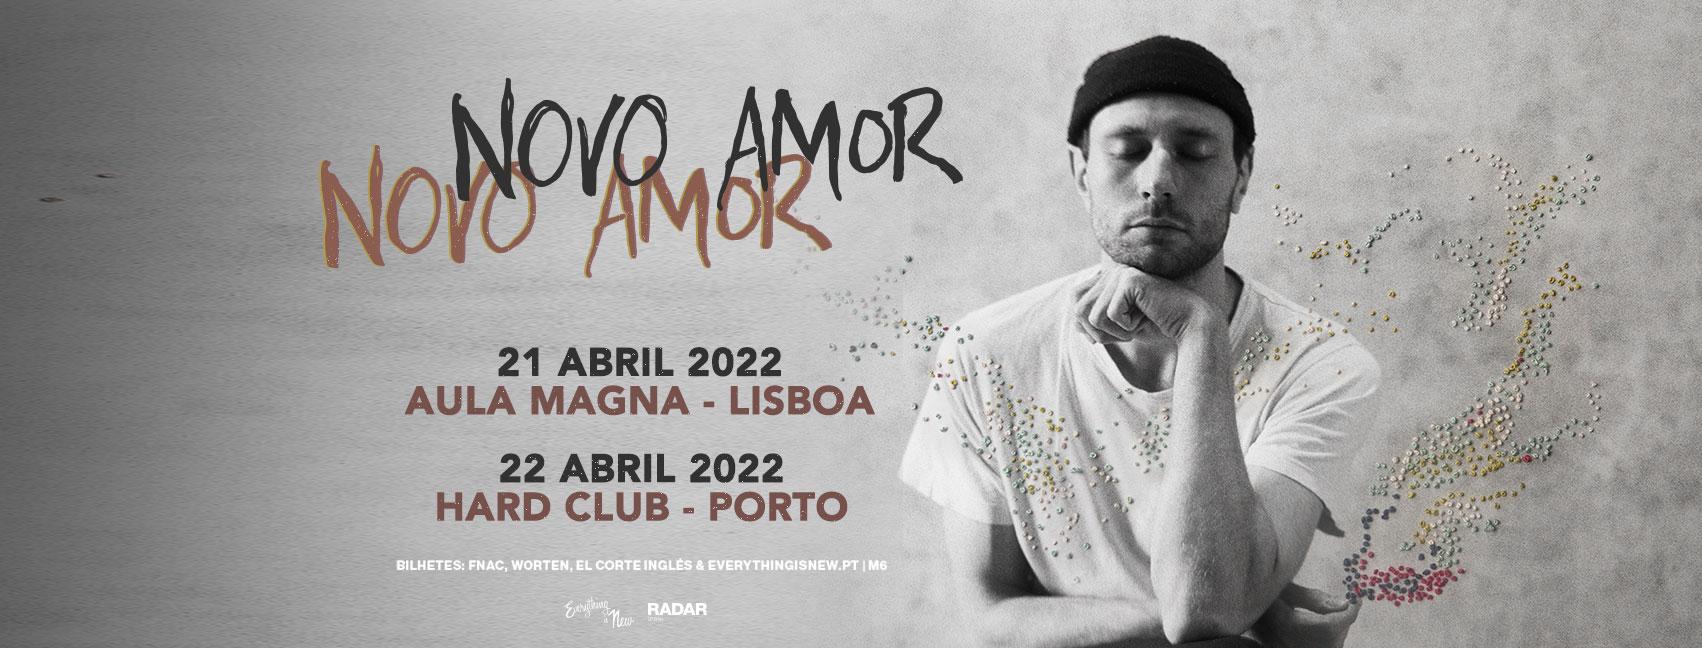 NOVO AMOR // HARD CLUB